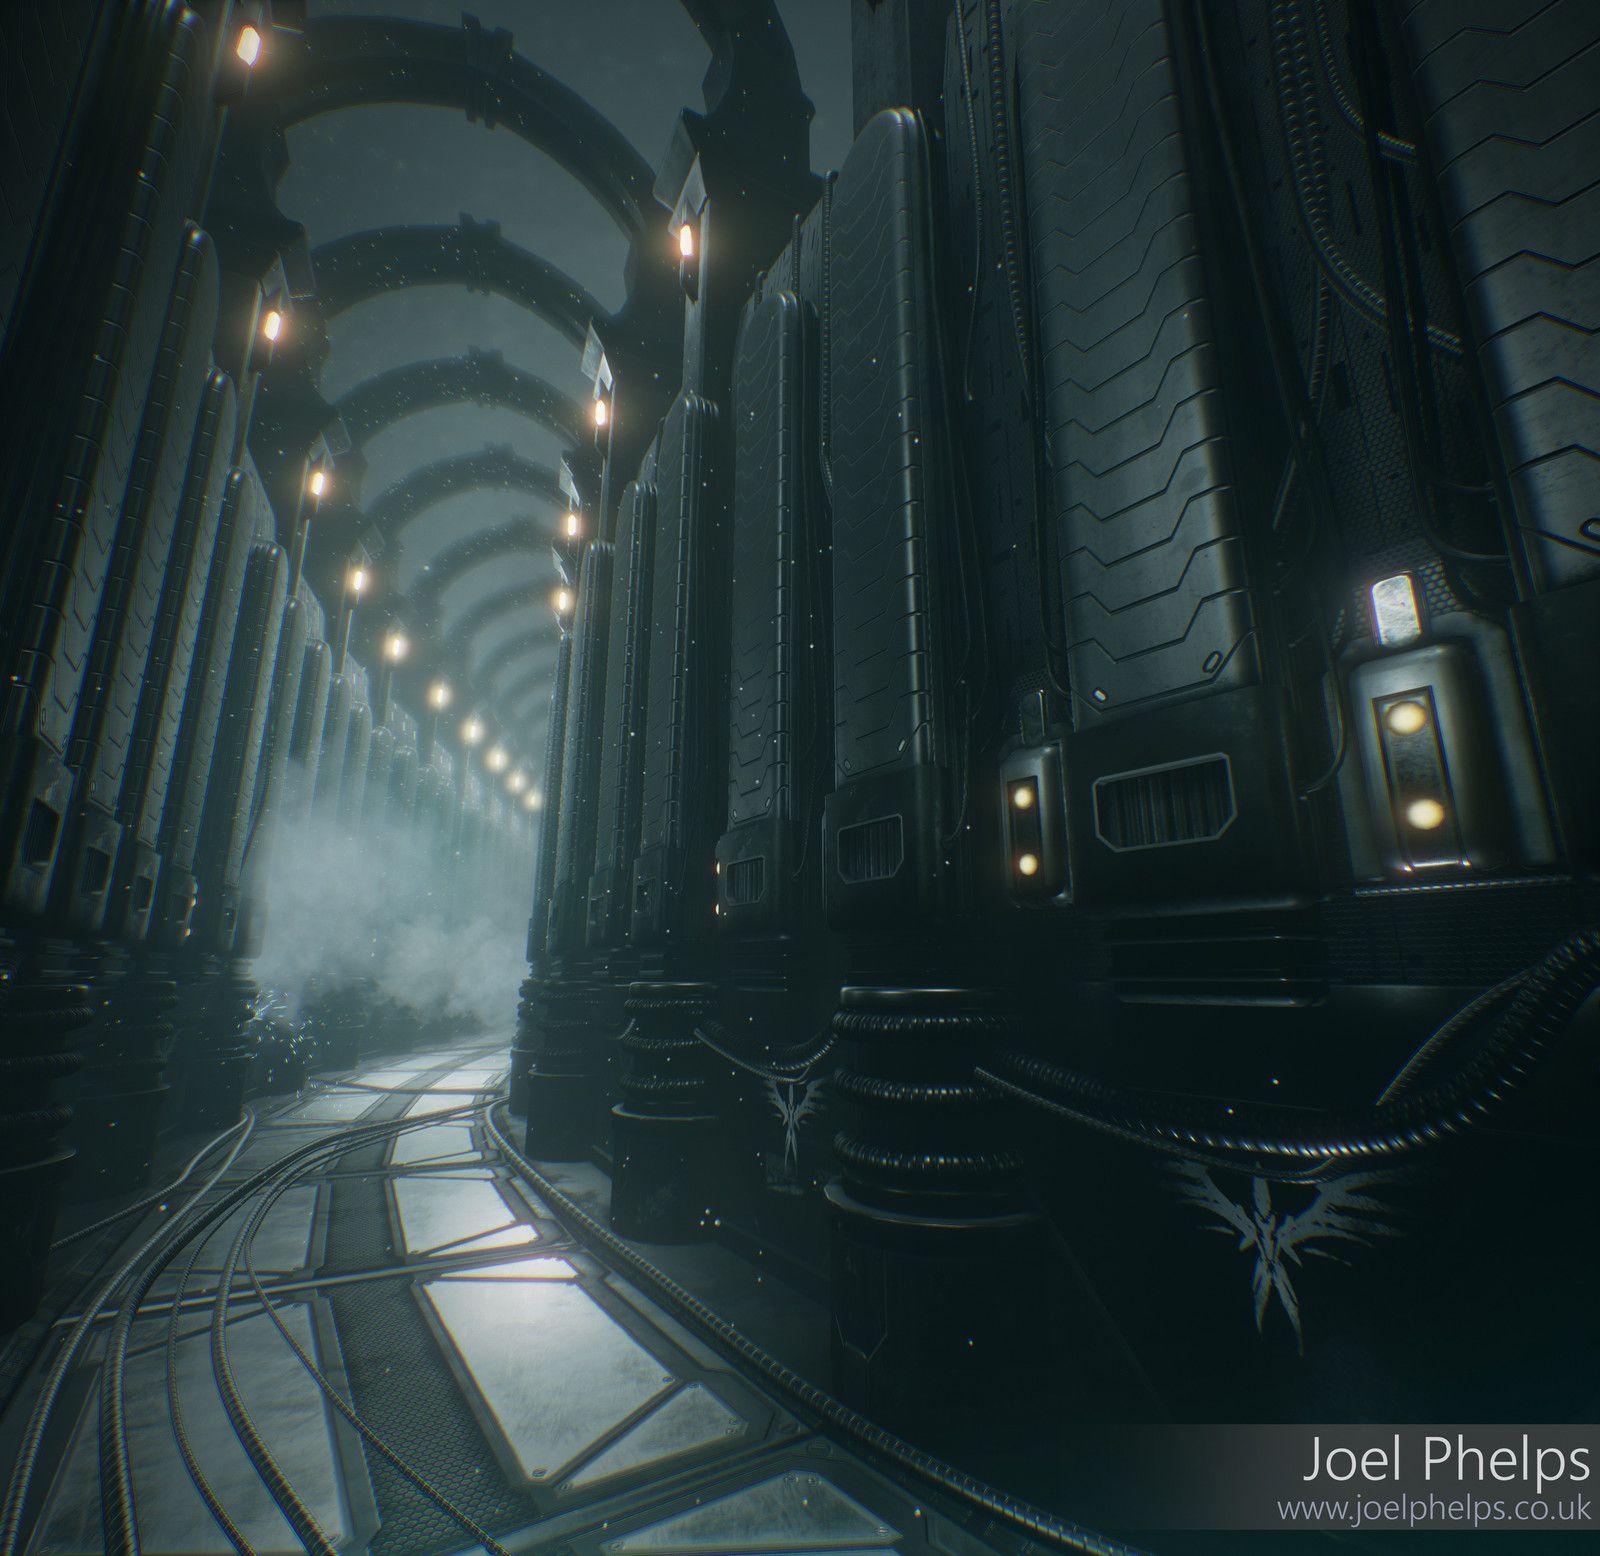 Alien Corridor, Joel Phelps on ArtStation at https://www.artstation.com/artwork/518rw